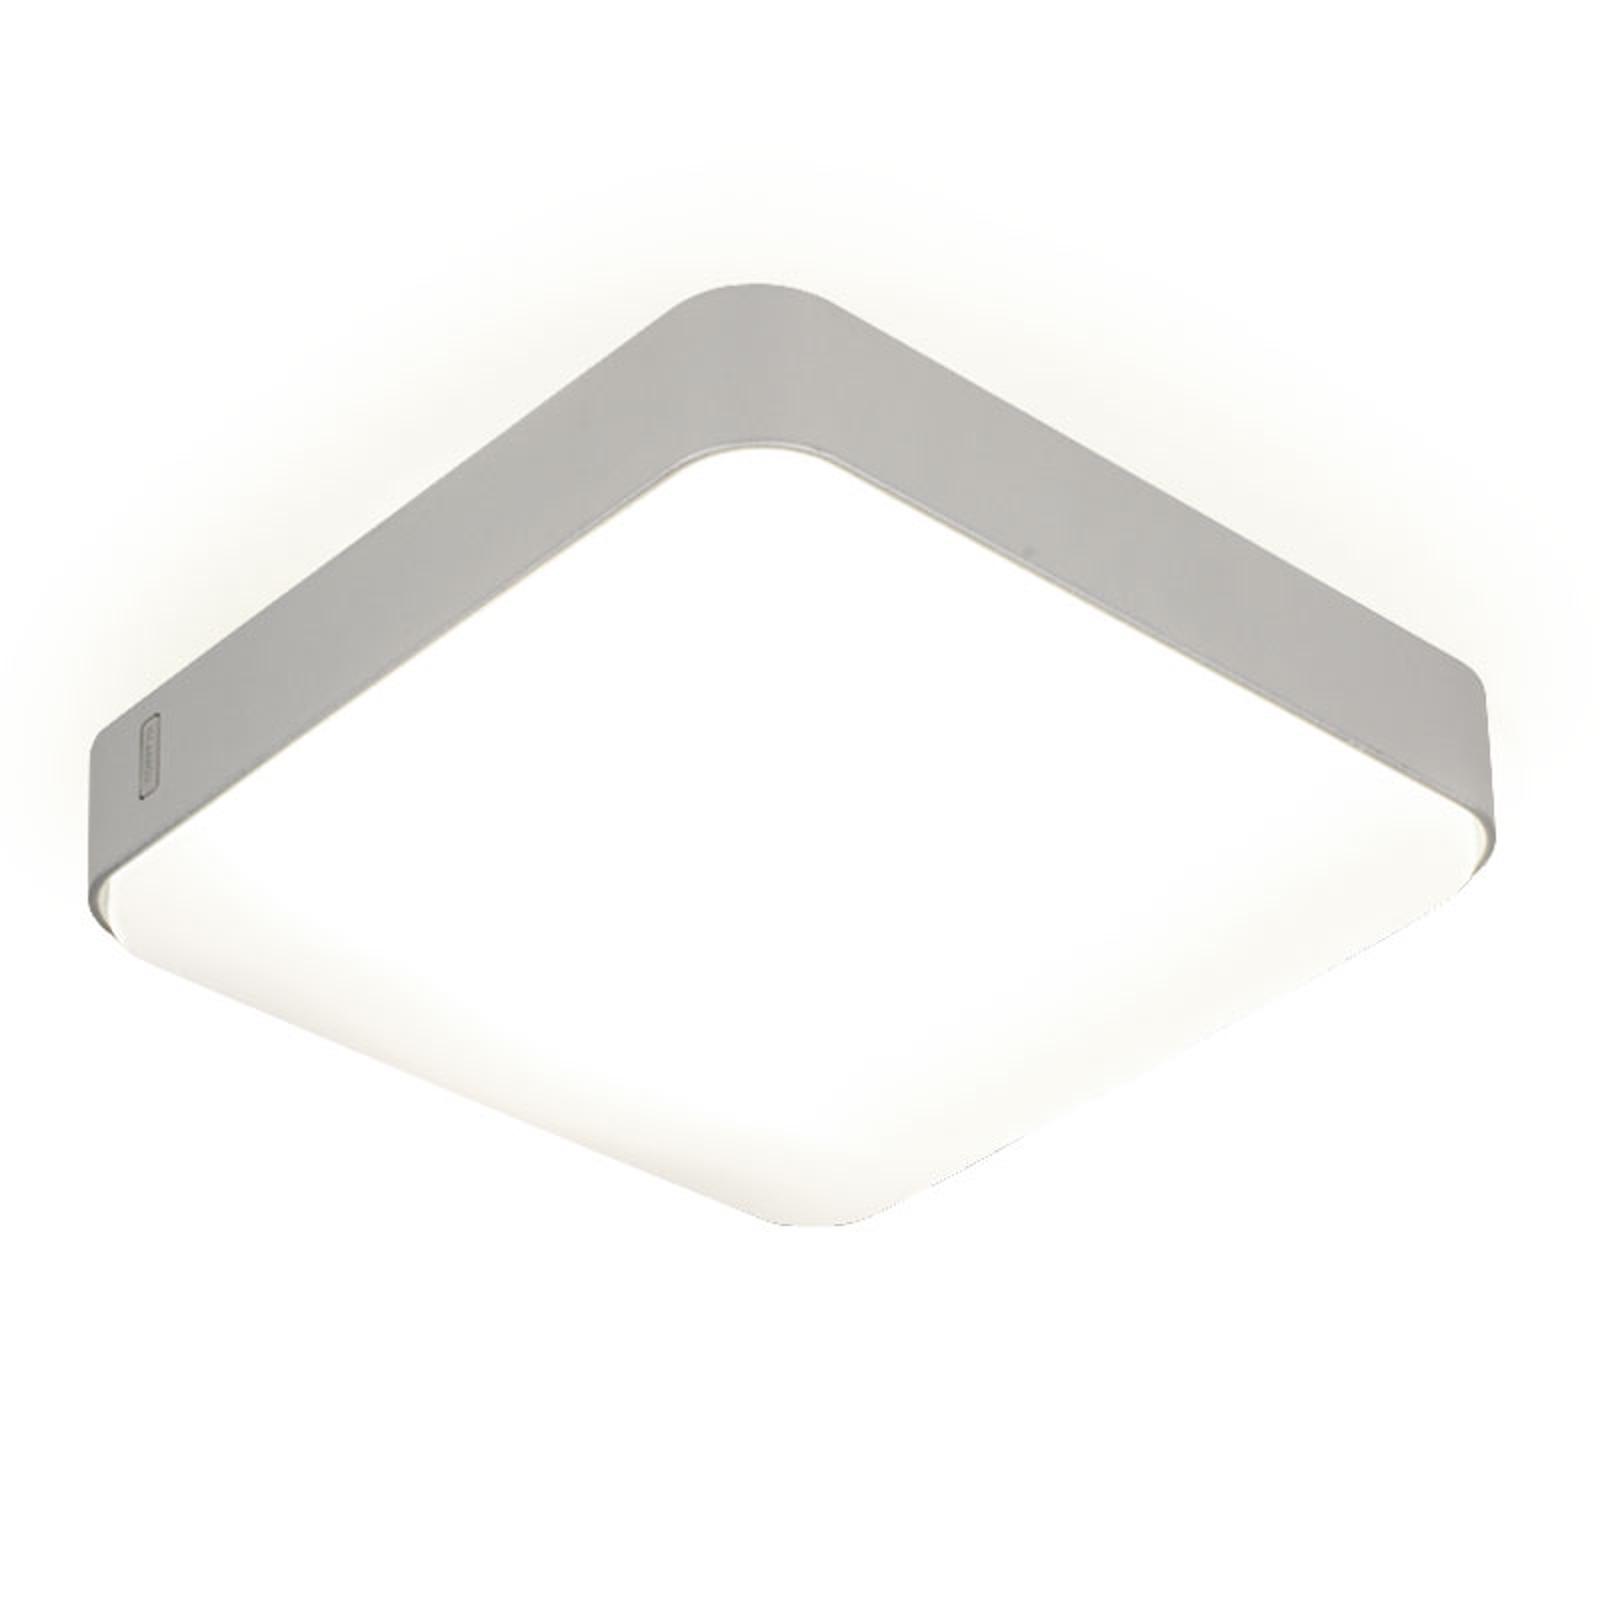 A20-SQ LED-taklampe, 40x40 cm, 4000 K